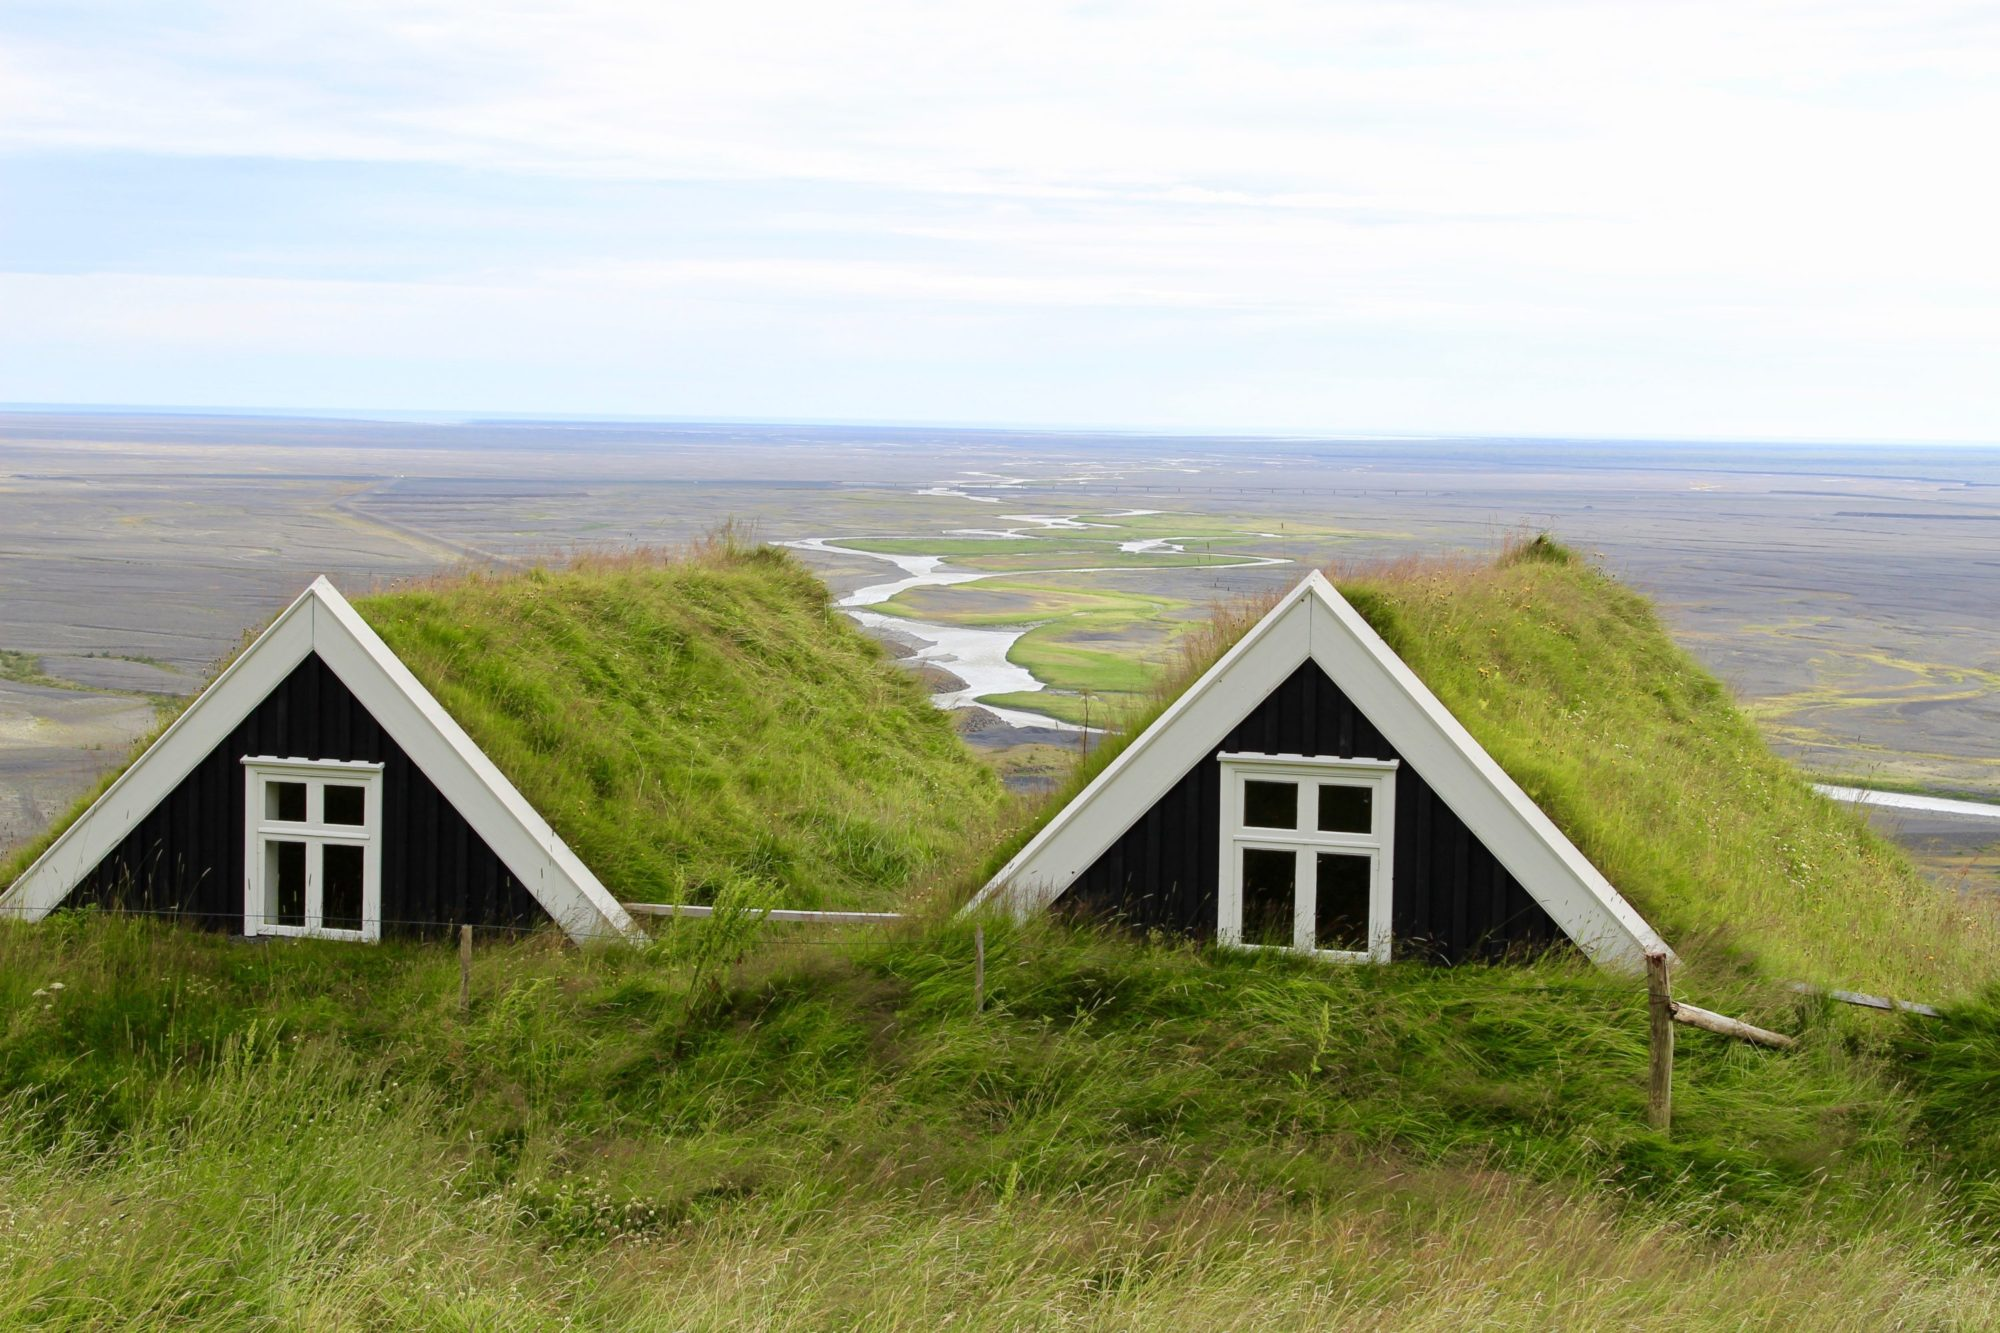 IMG 1266 e1535708496289 ICELAND ROAD TRIP